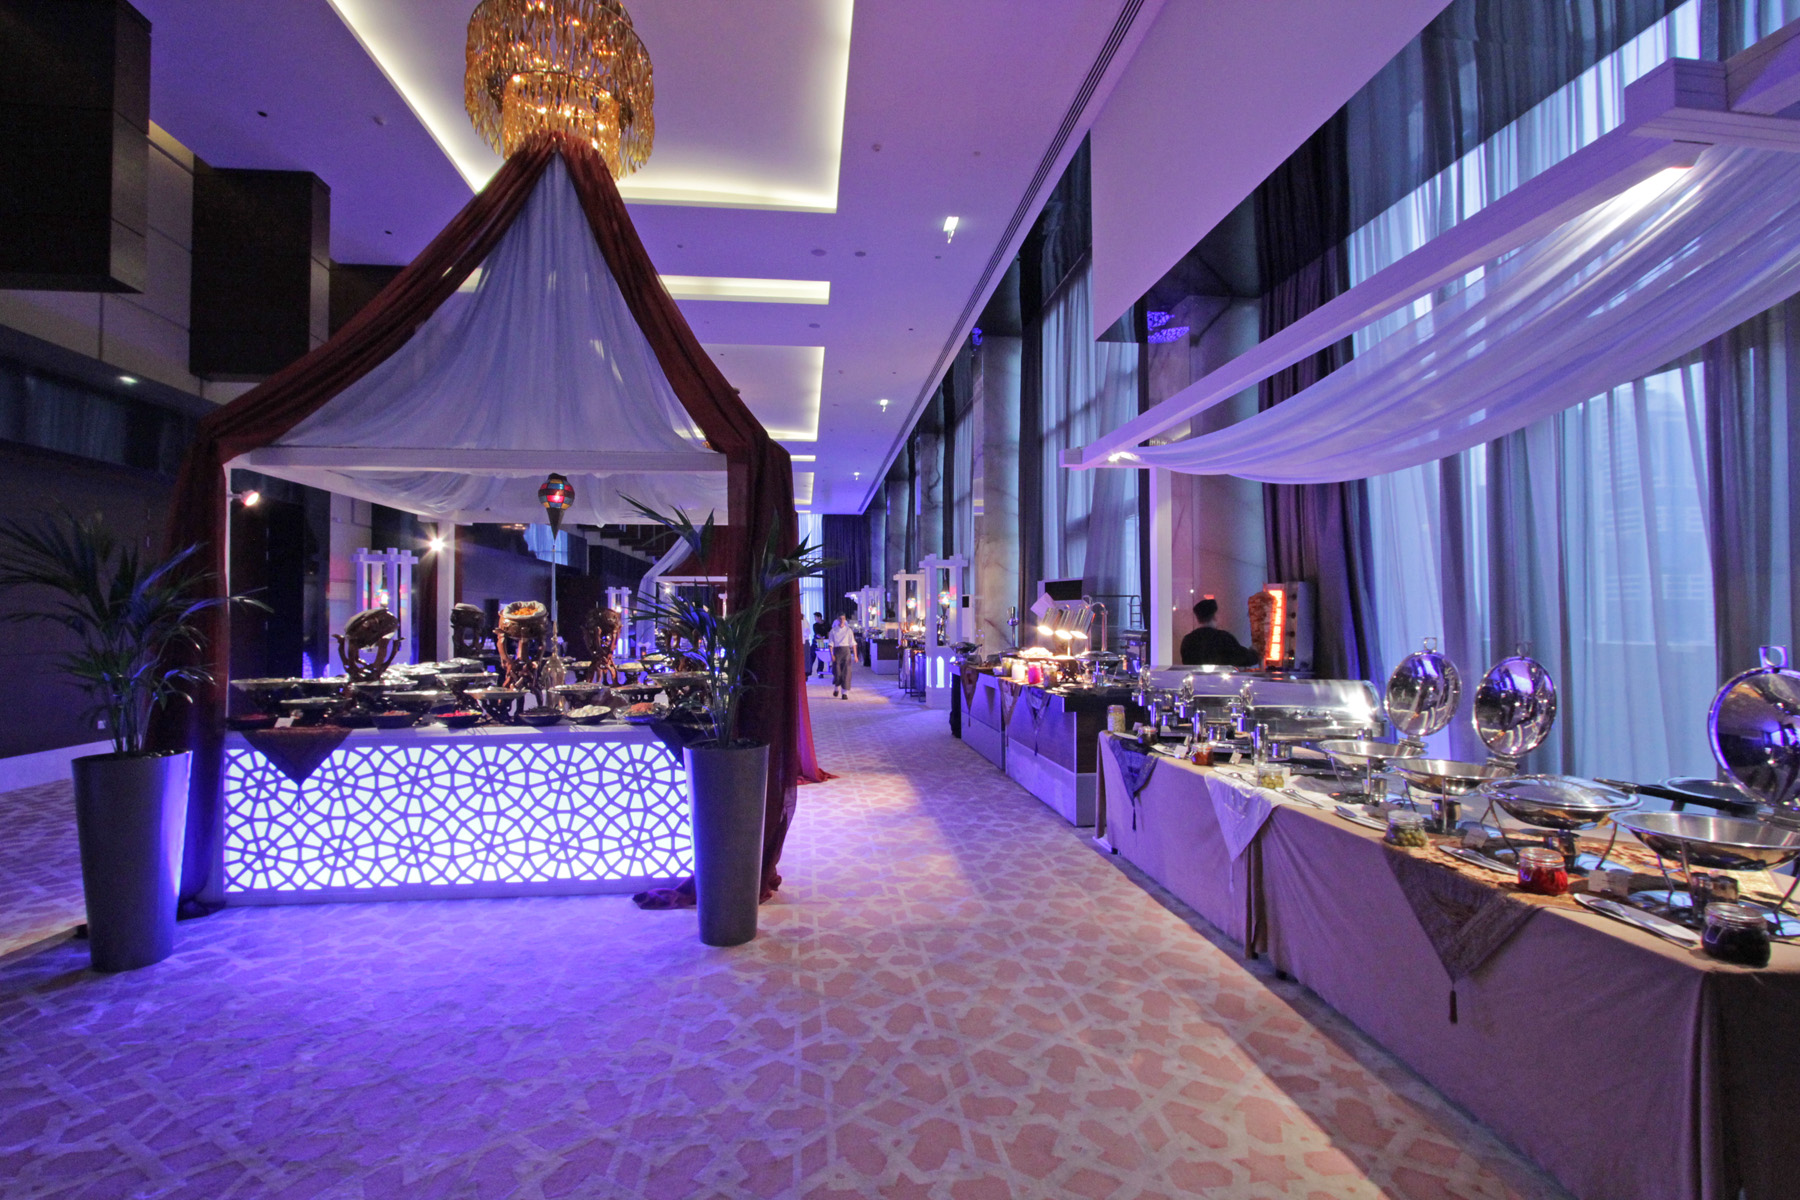 ramadan in dubai Ramadan in dubai, etiquette to be followed during ramadan, are public amenities affected which restaurants offer dine during ramadan in the morning.